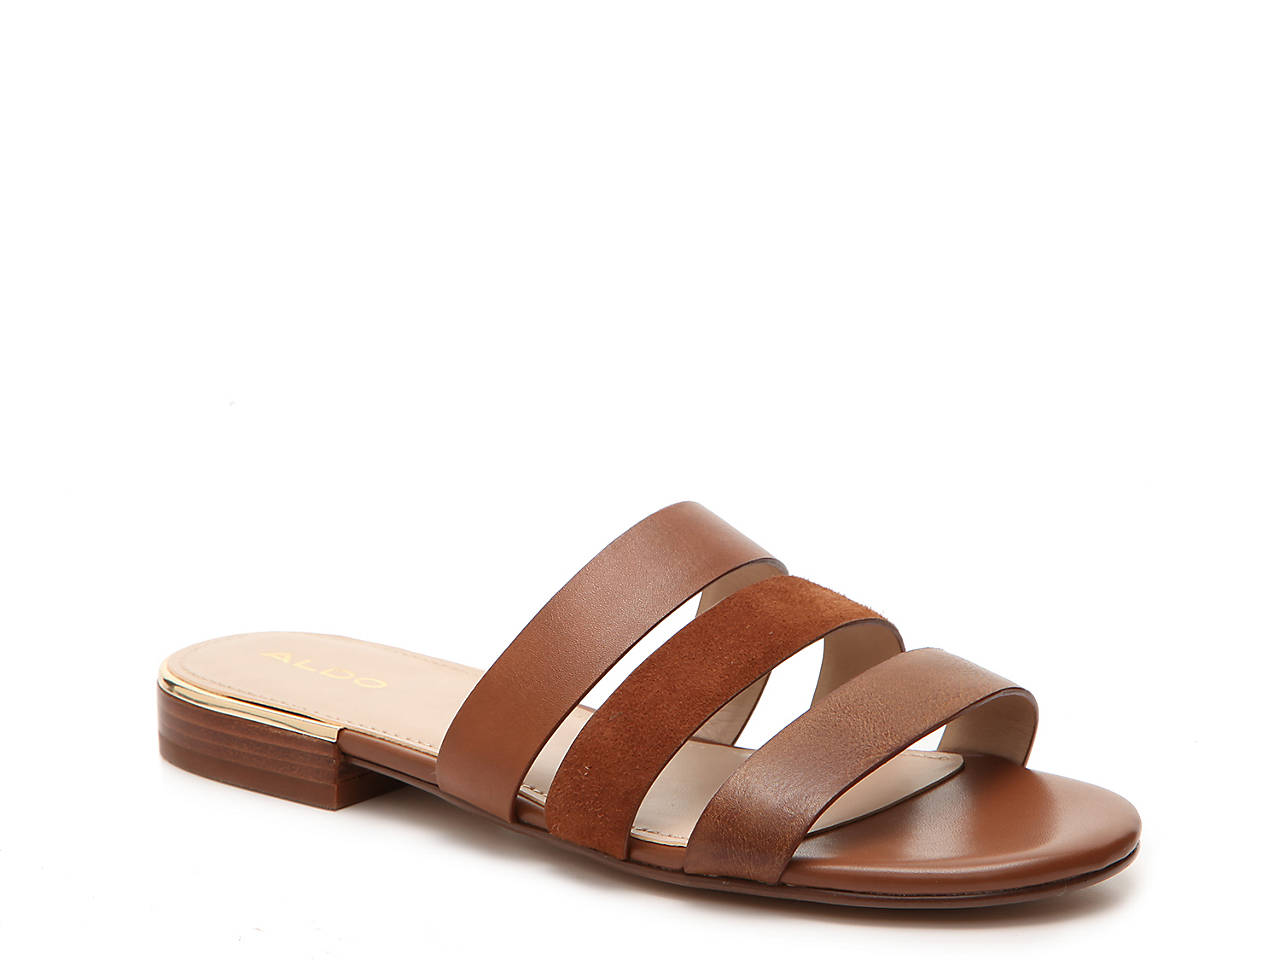 3b697f5d7 Aldo Ulerasa Flat Sandal Women s Shoes